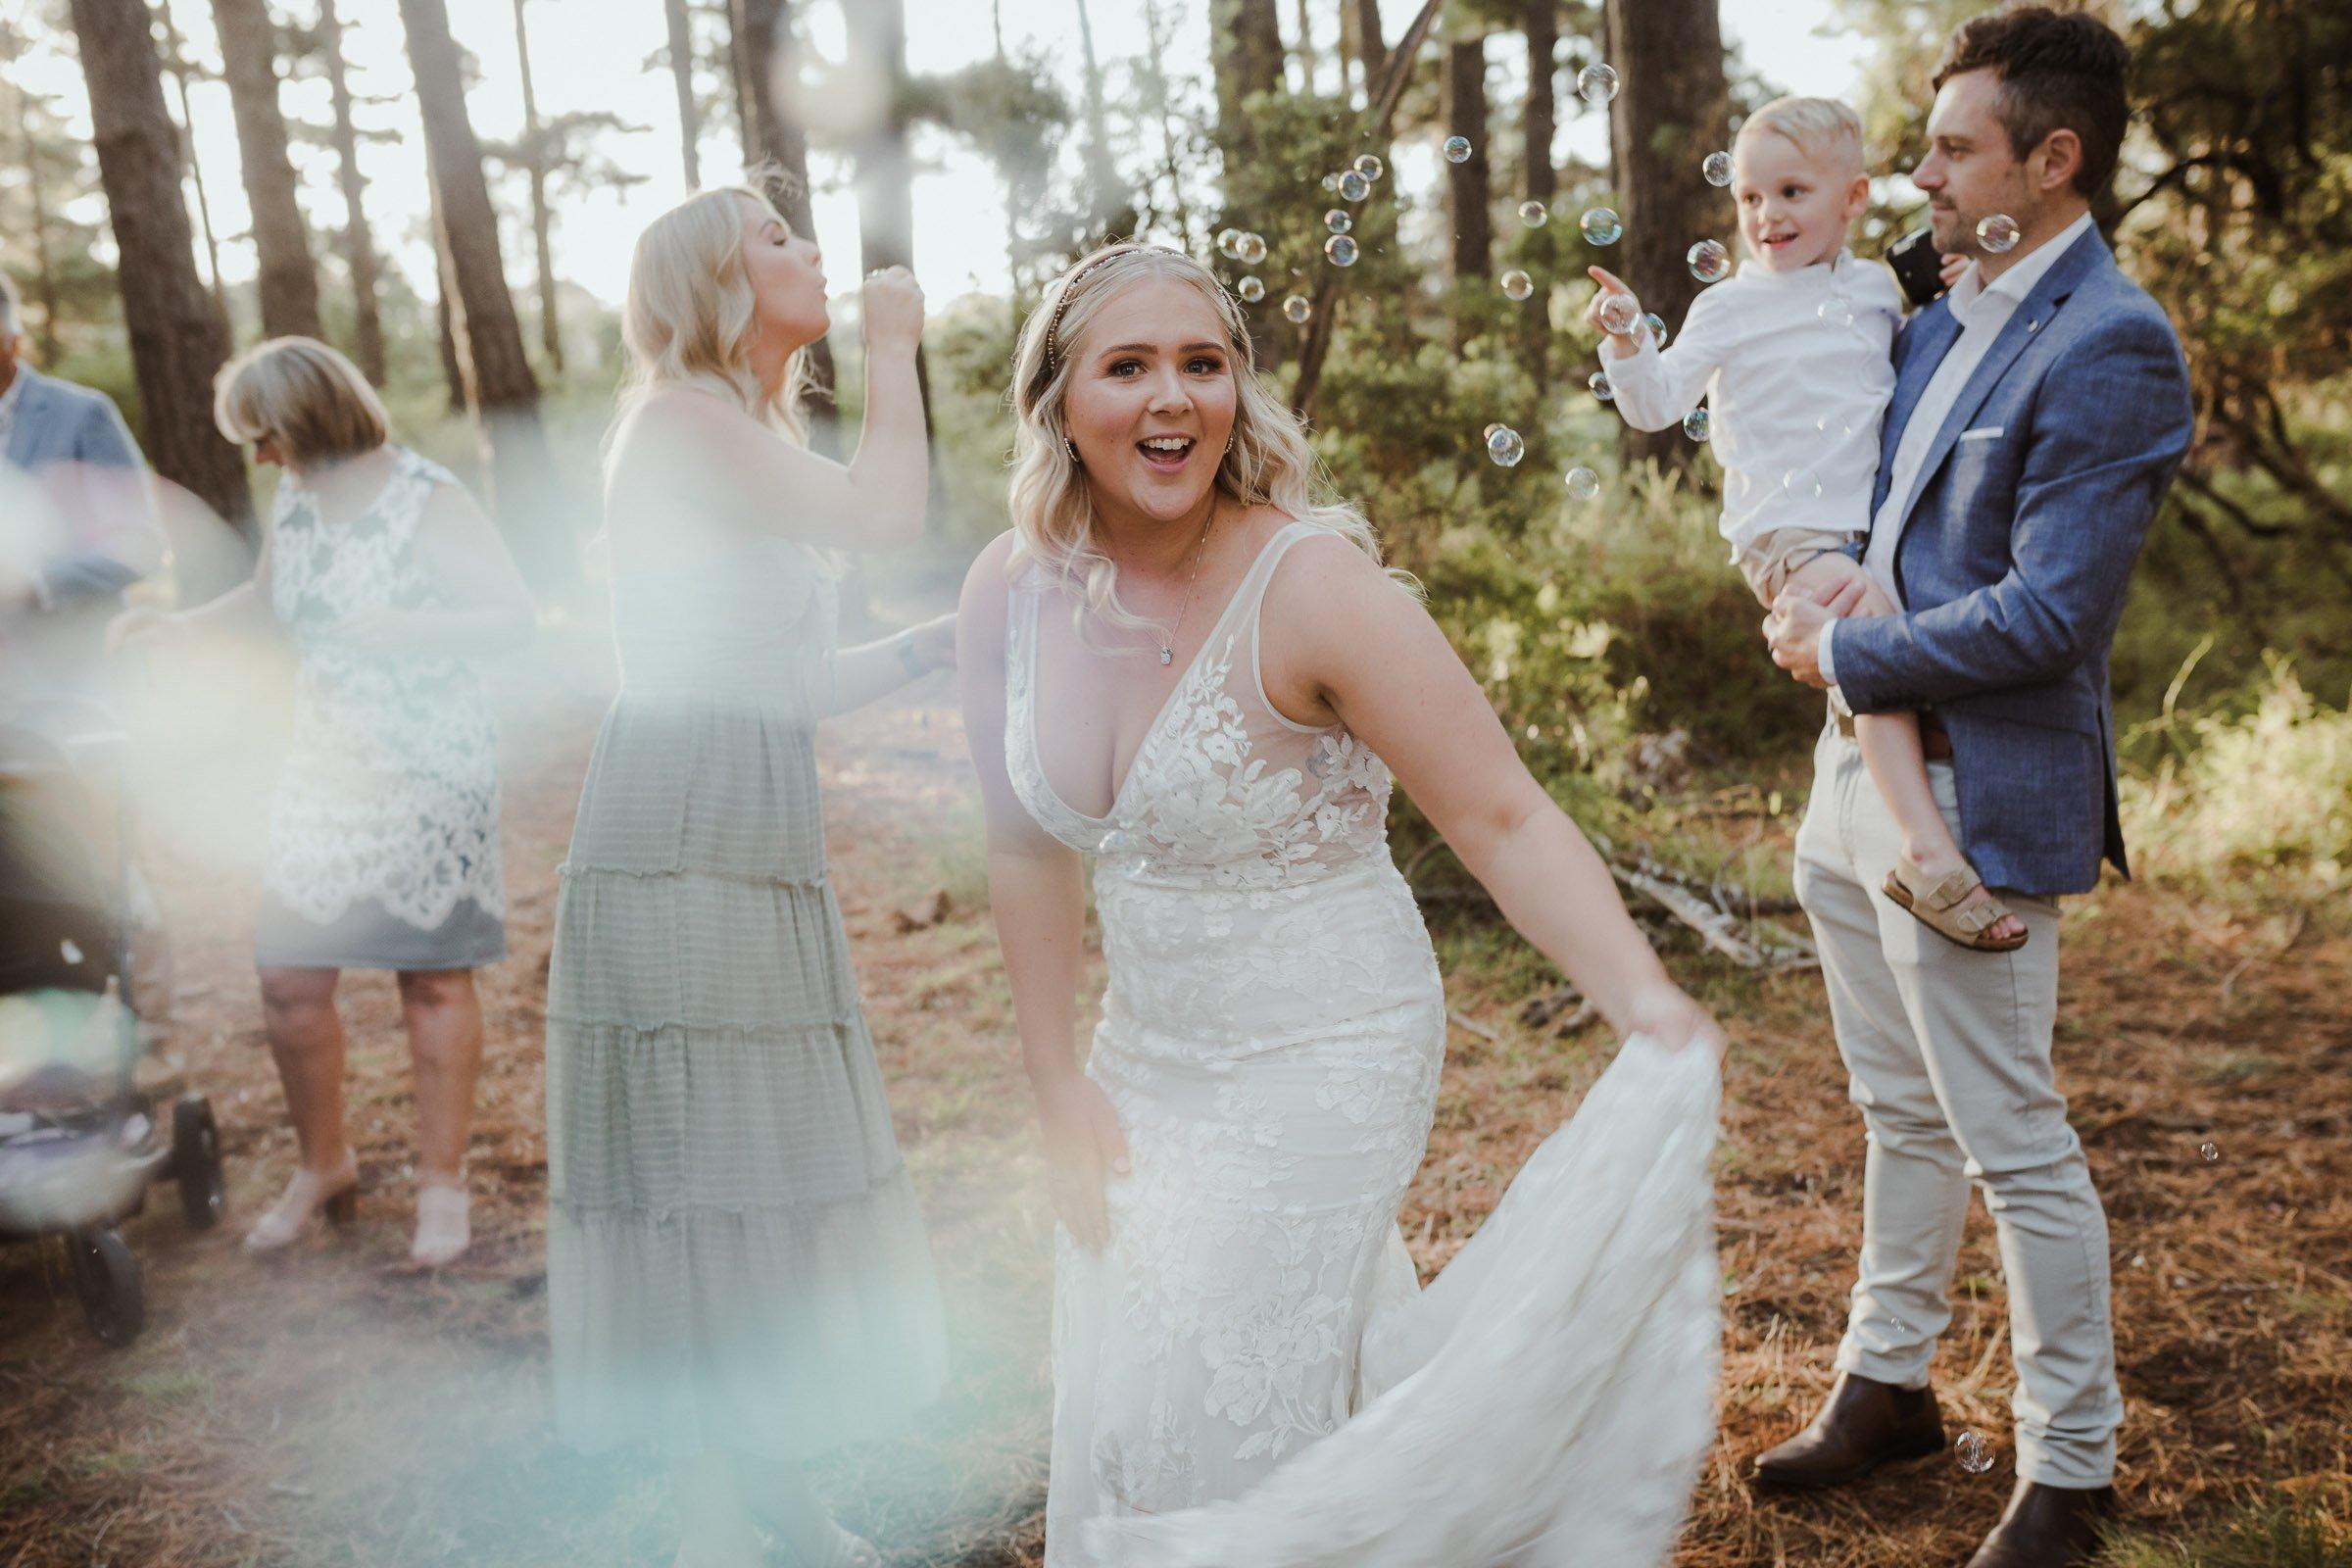 Photographer for adventurous elopements & intimate weddings on Mornington Peninsula, Melbourne.